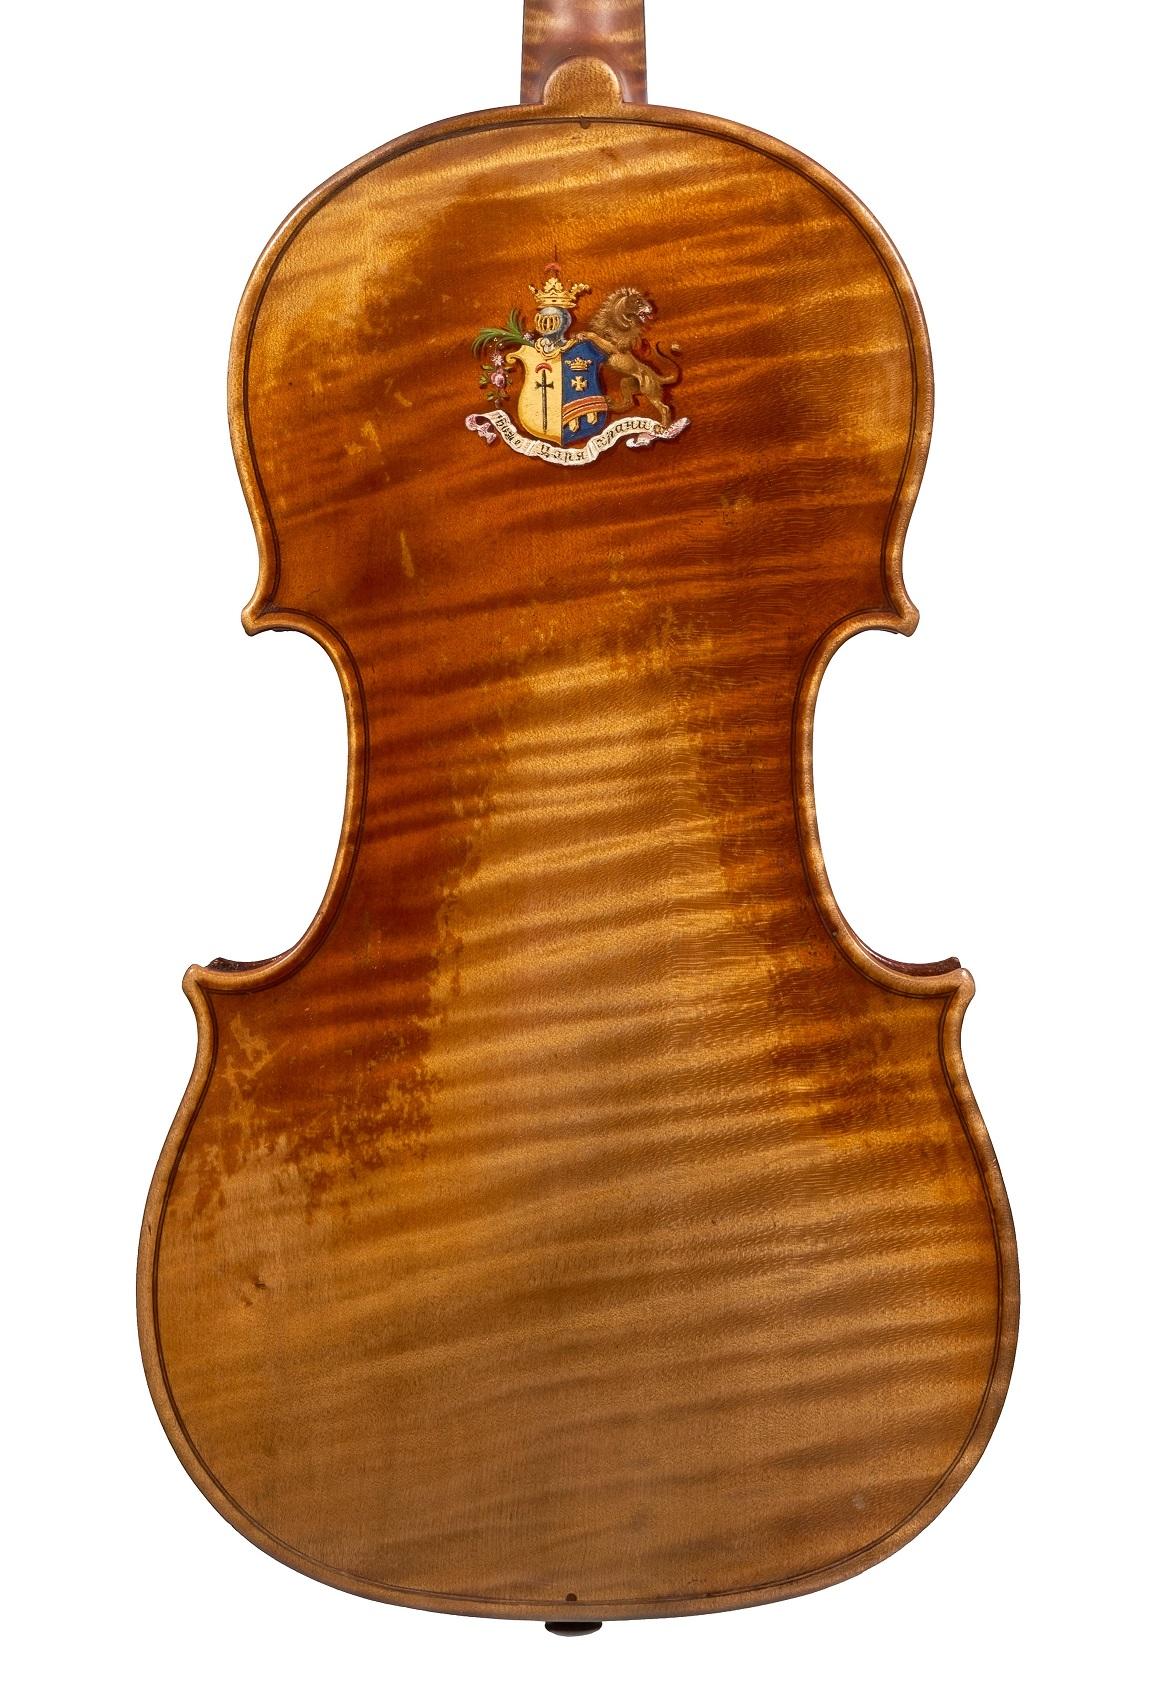 Back of the Tsar Nicholas violin by J.B. Vuillaume, 1841